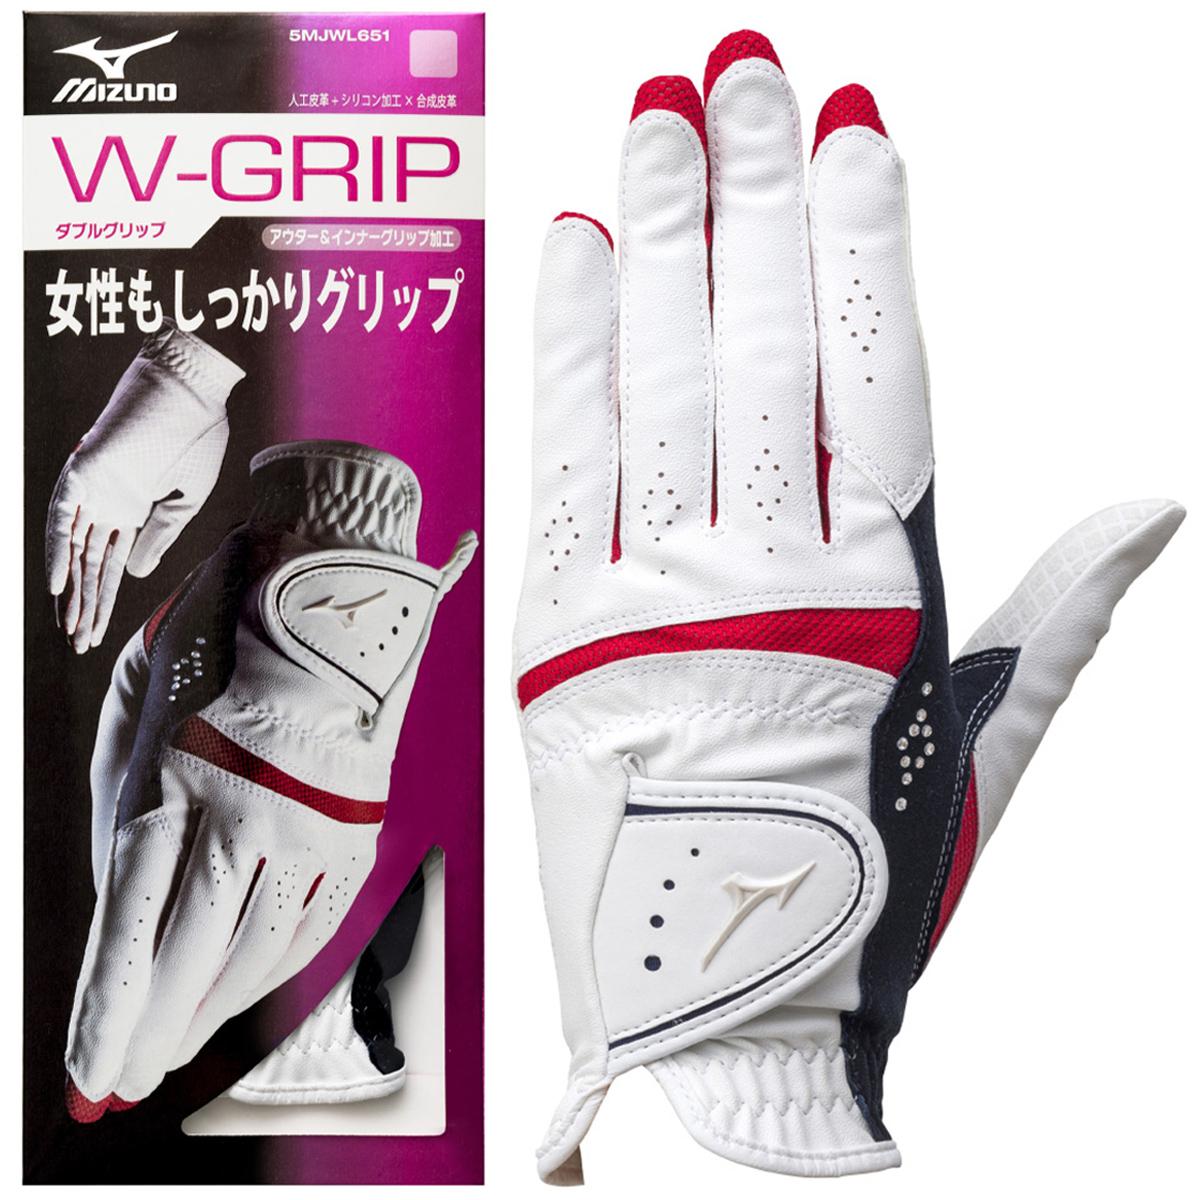 W-GRIP グローブ 両手用レディス